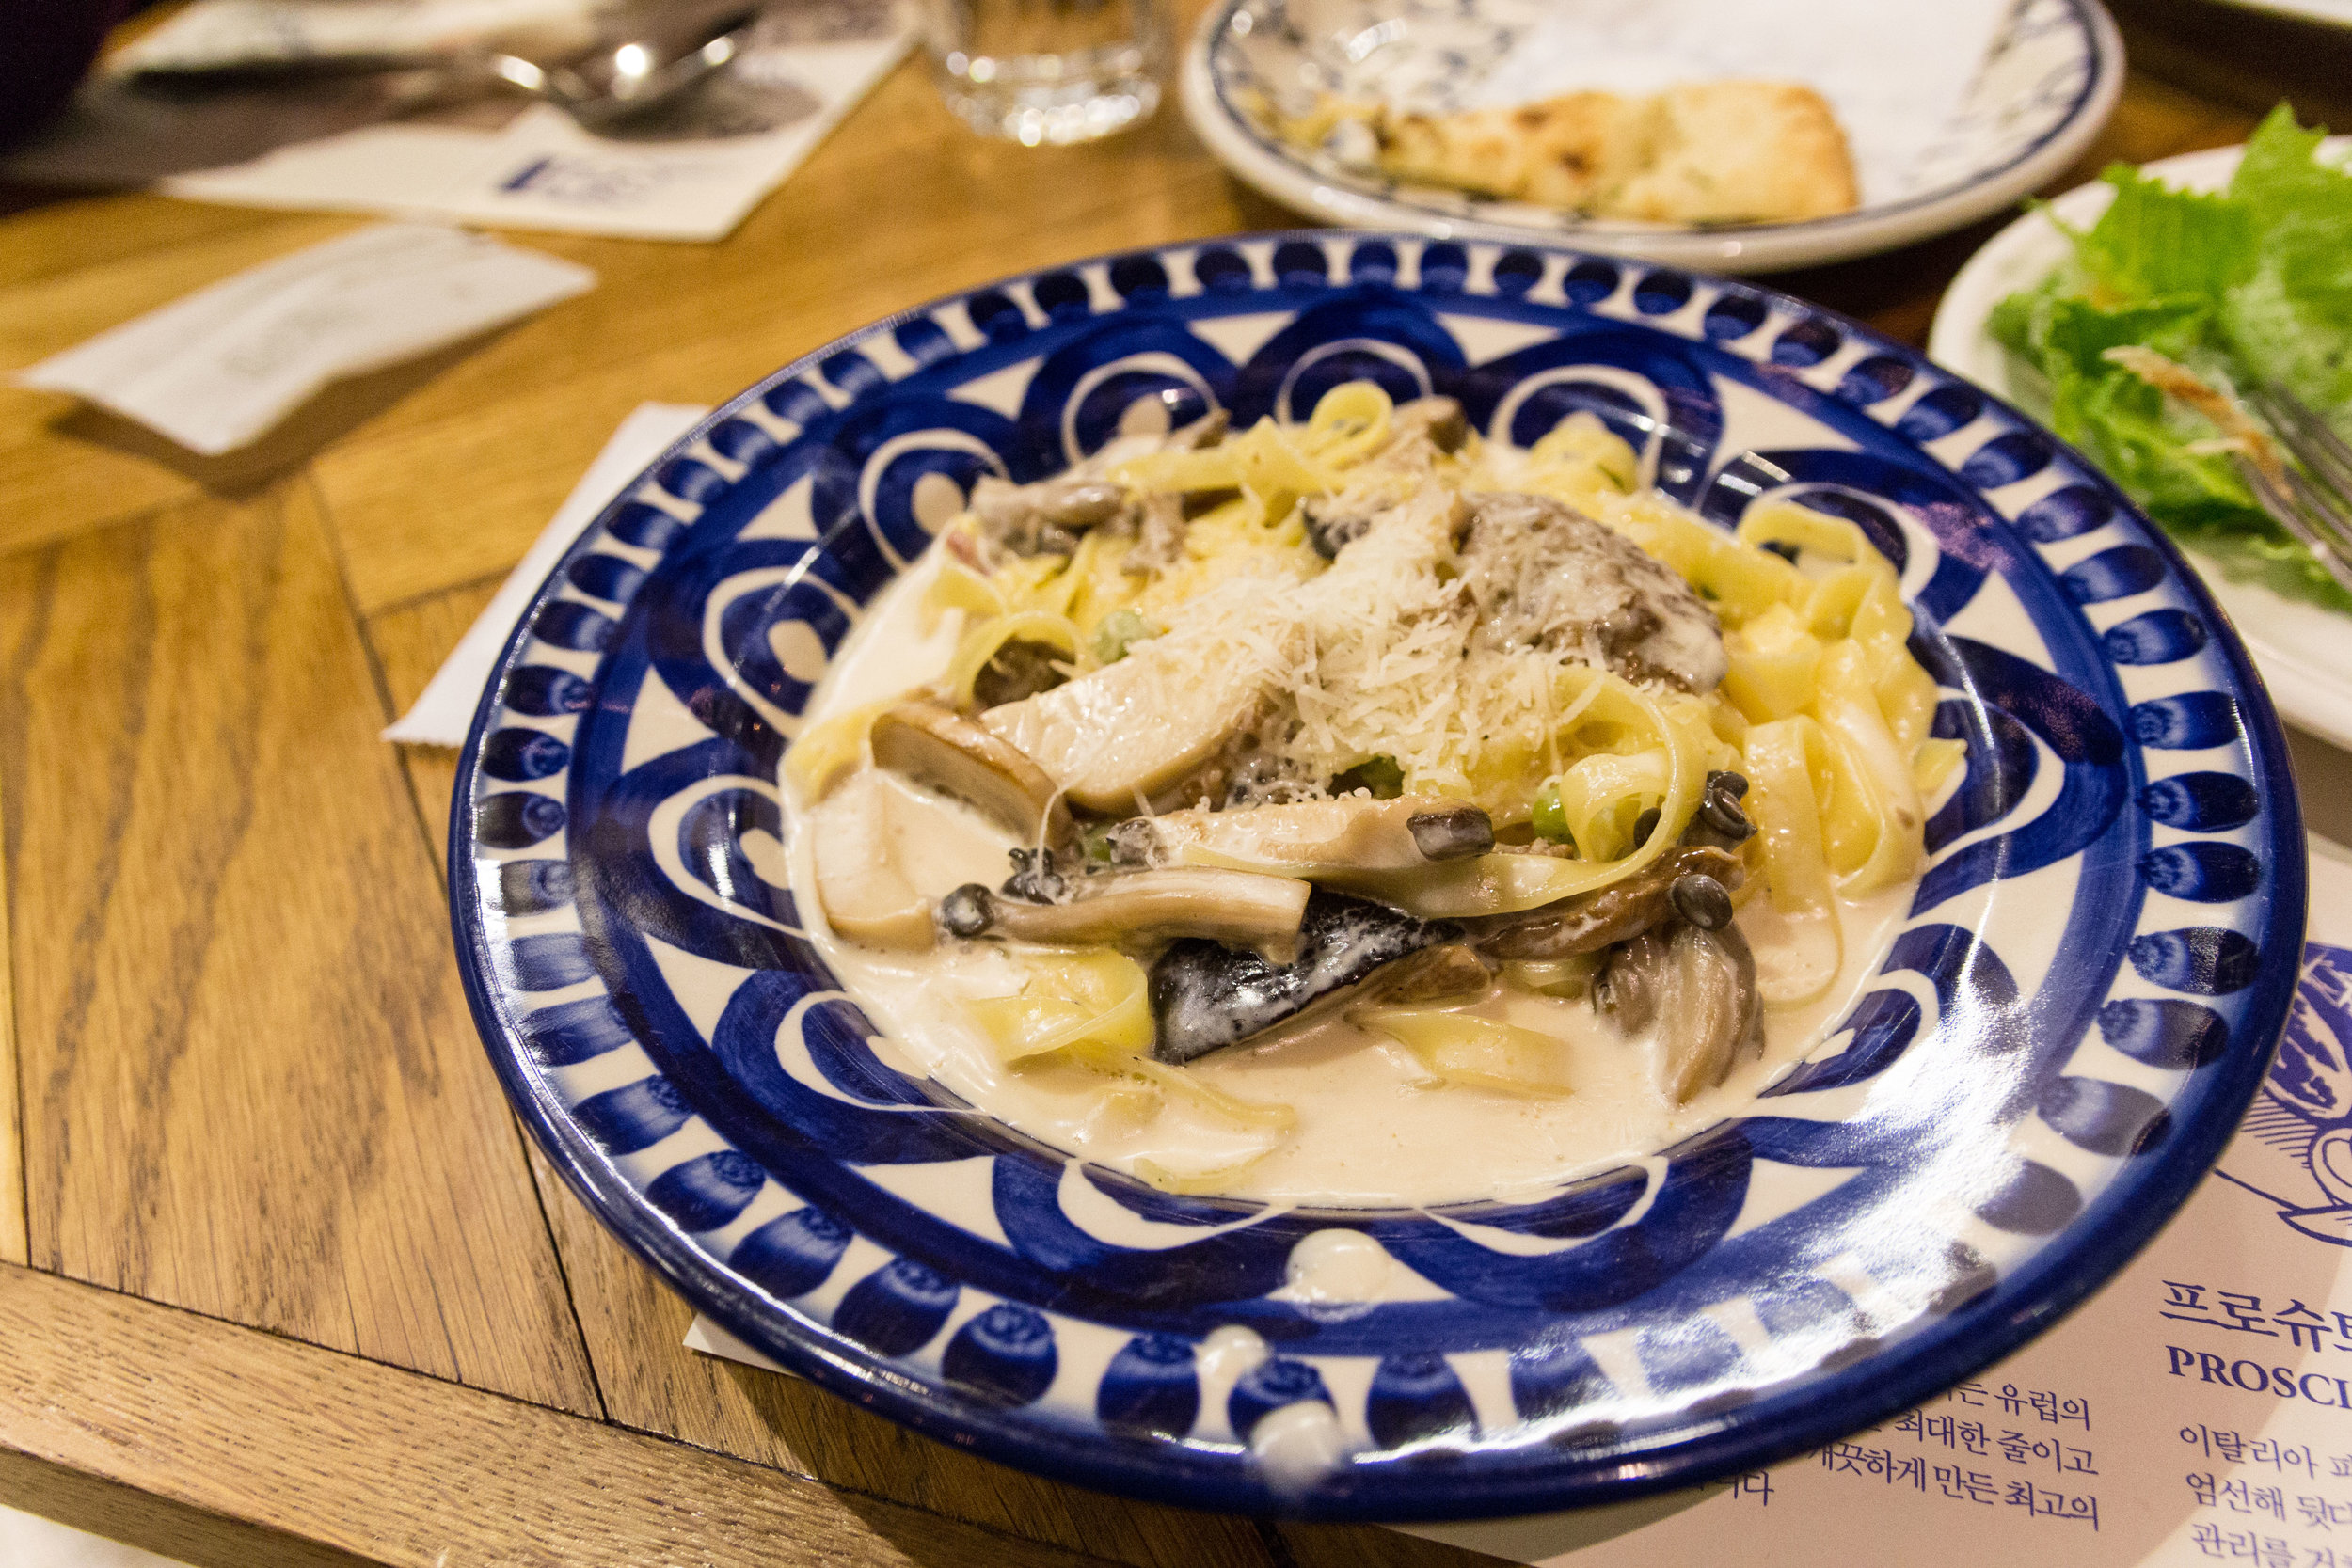 Mushroom creamy pasta